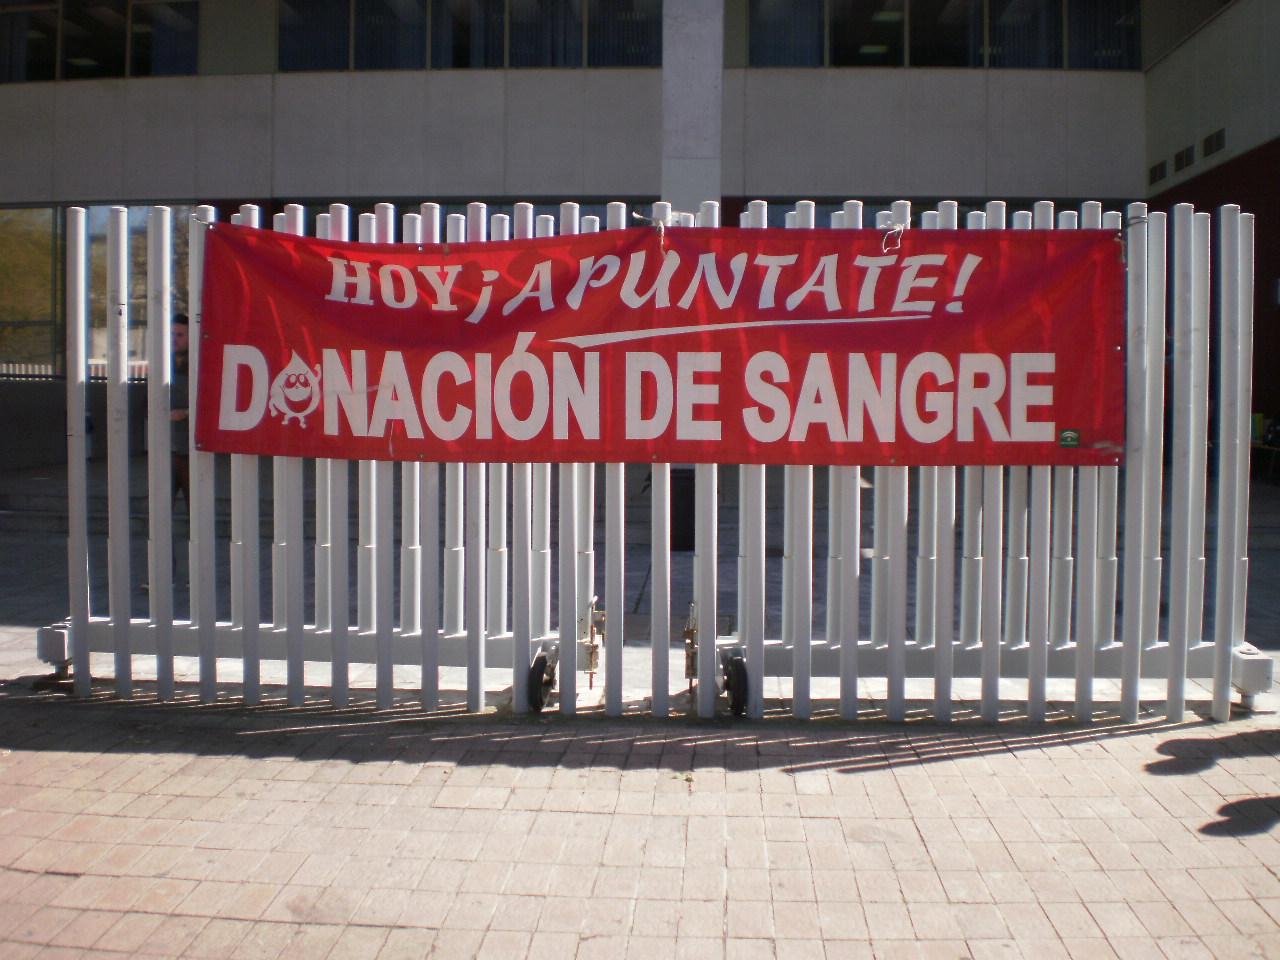 Eventos en sevilla hazte donante de sangre for Espectaculos en sevilla hoy